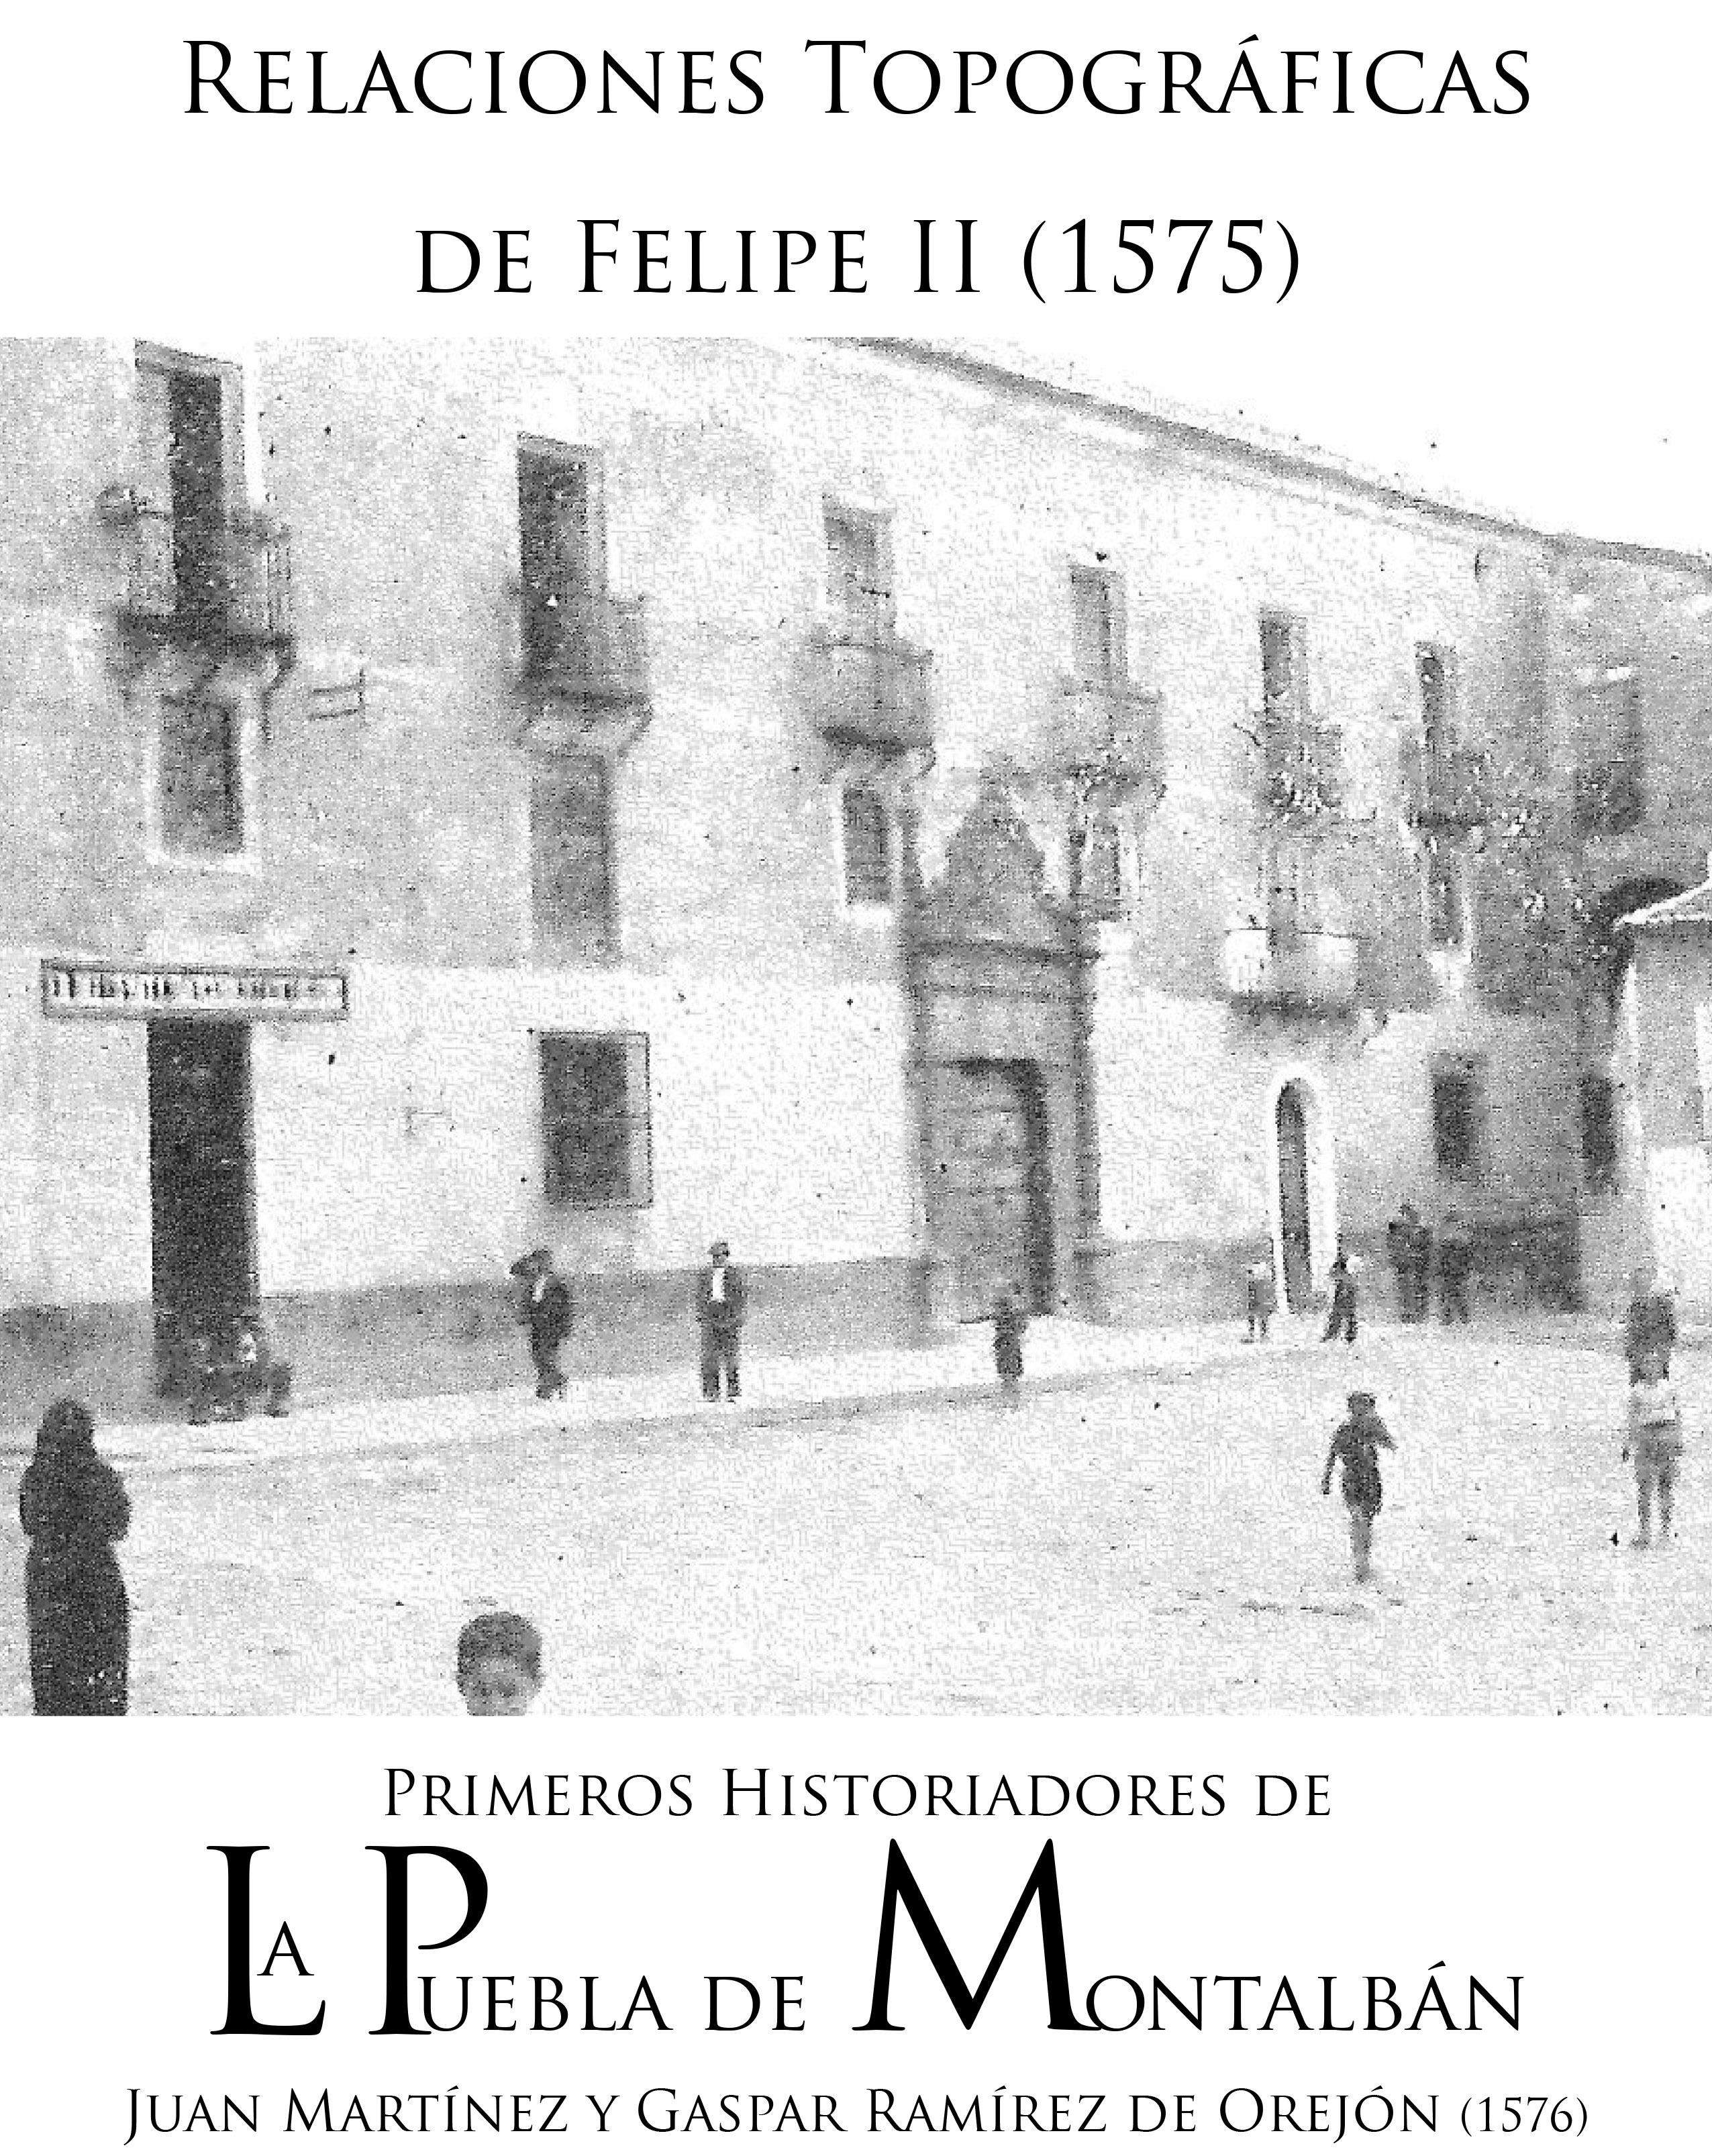 Separata Primeros Historiadores.indd